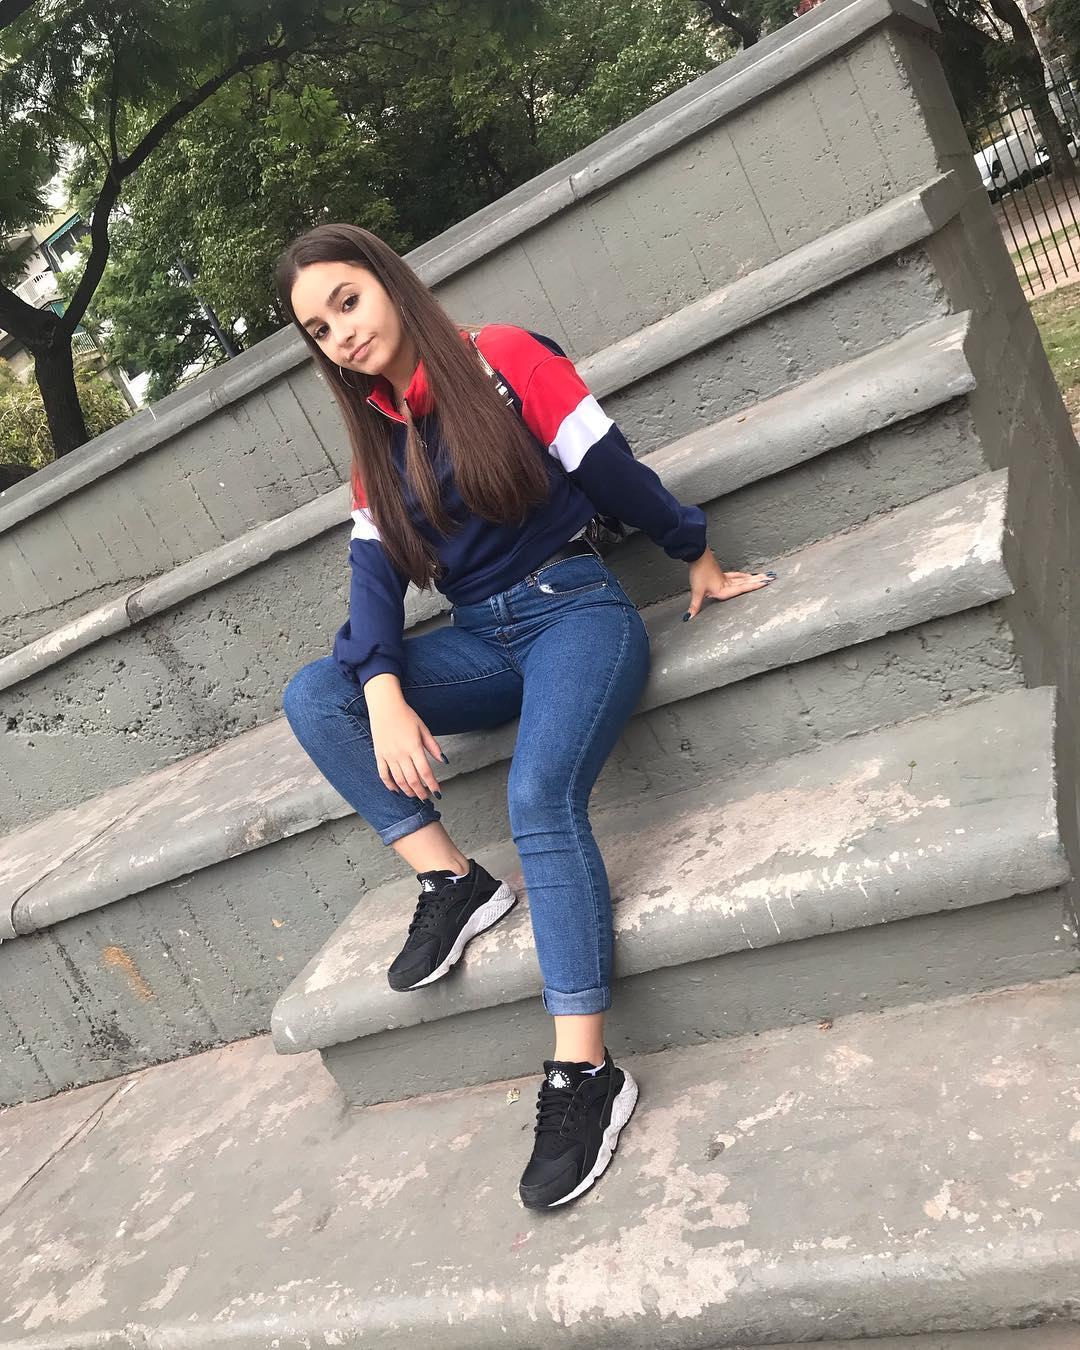 Camila-Nerea-Gonzalez-Wallpapers-Insta-Fit-Bio-1